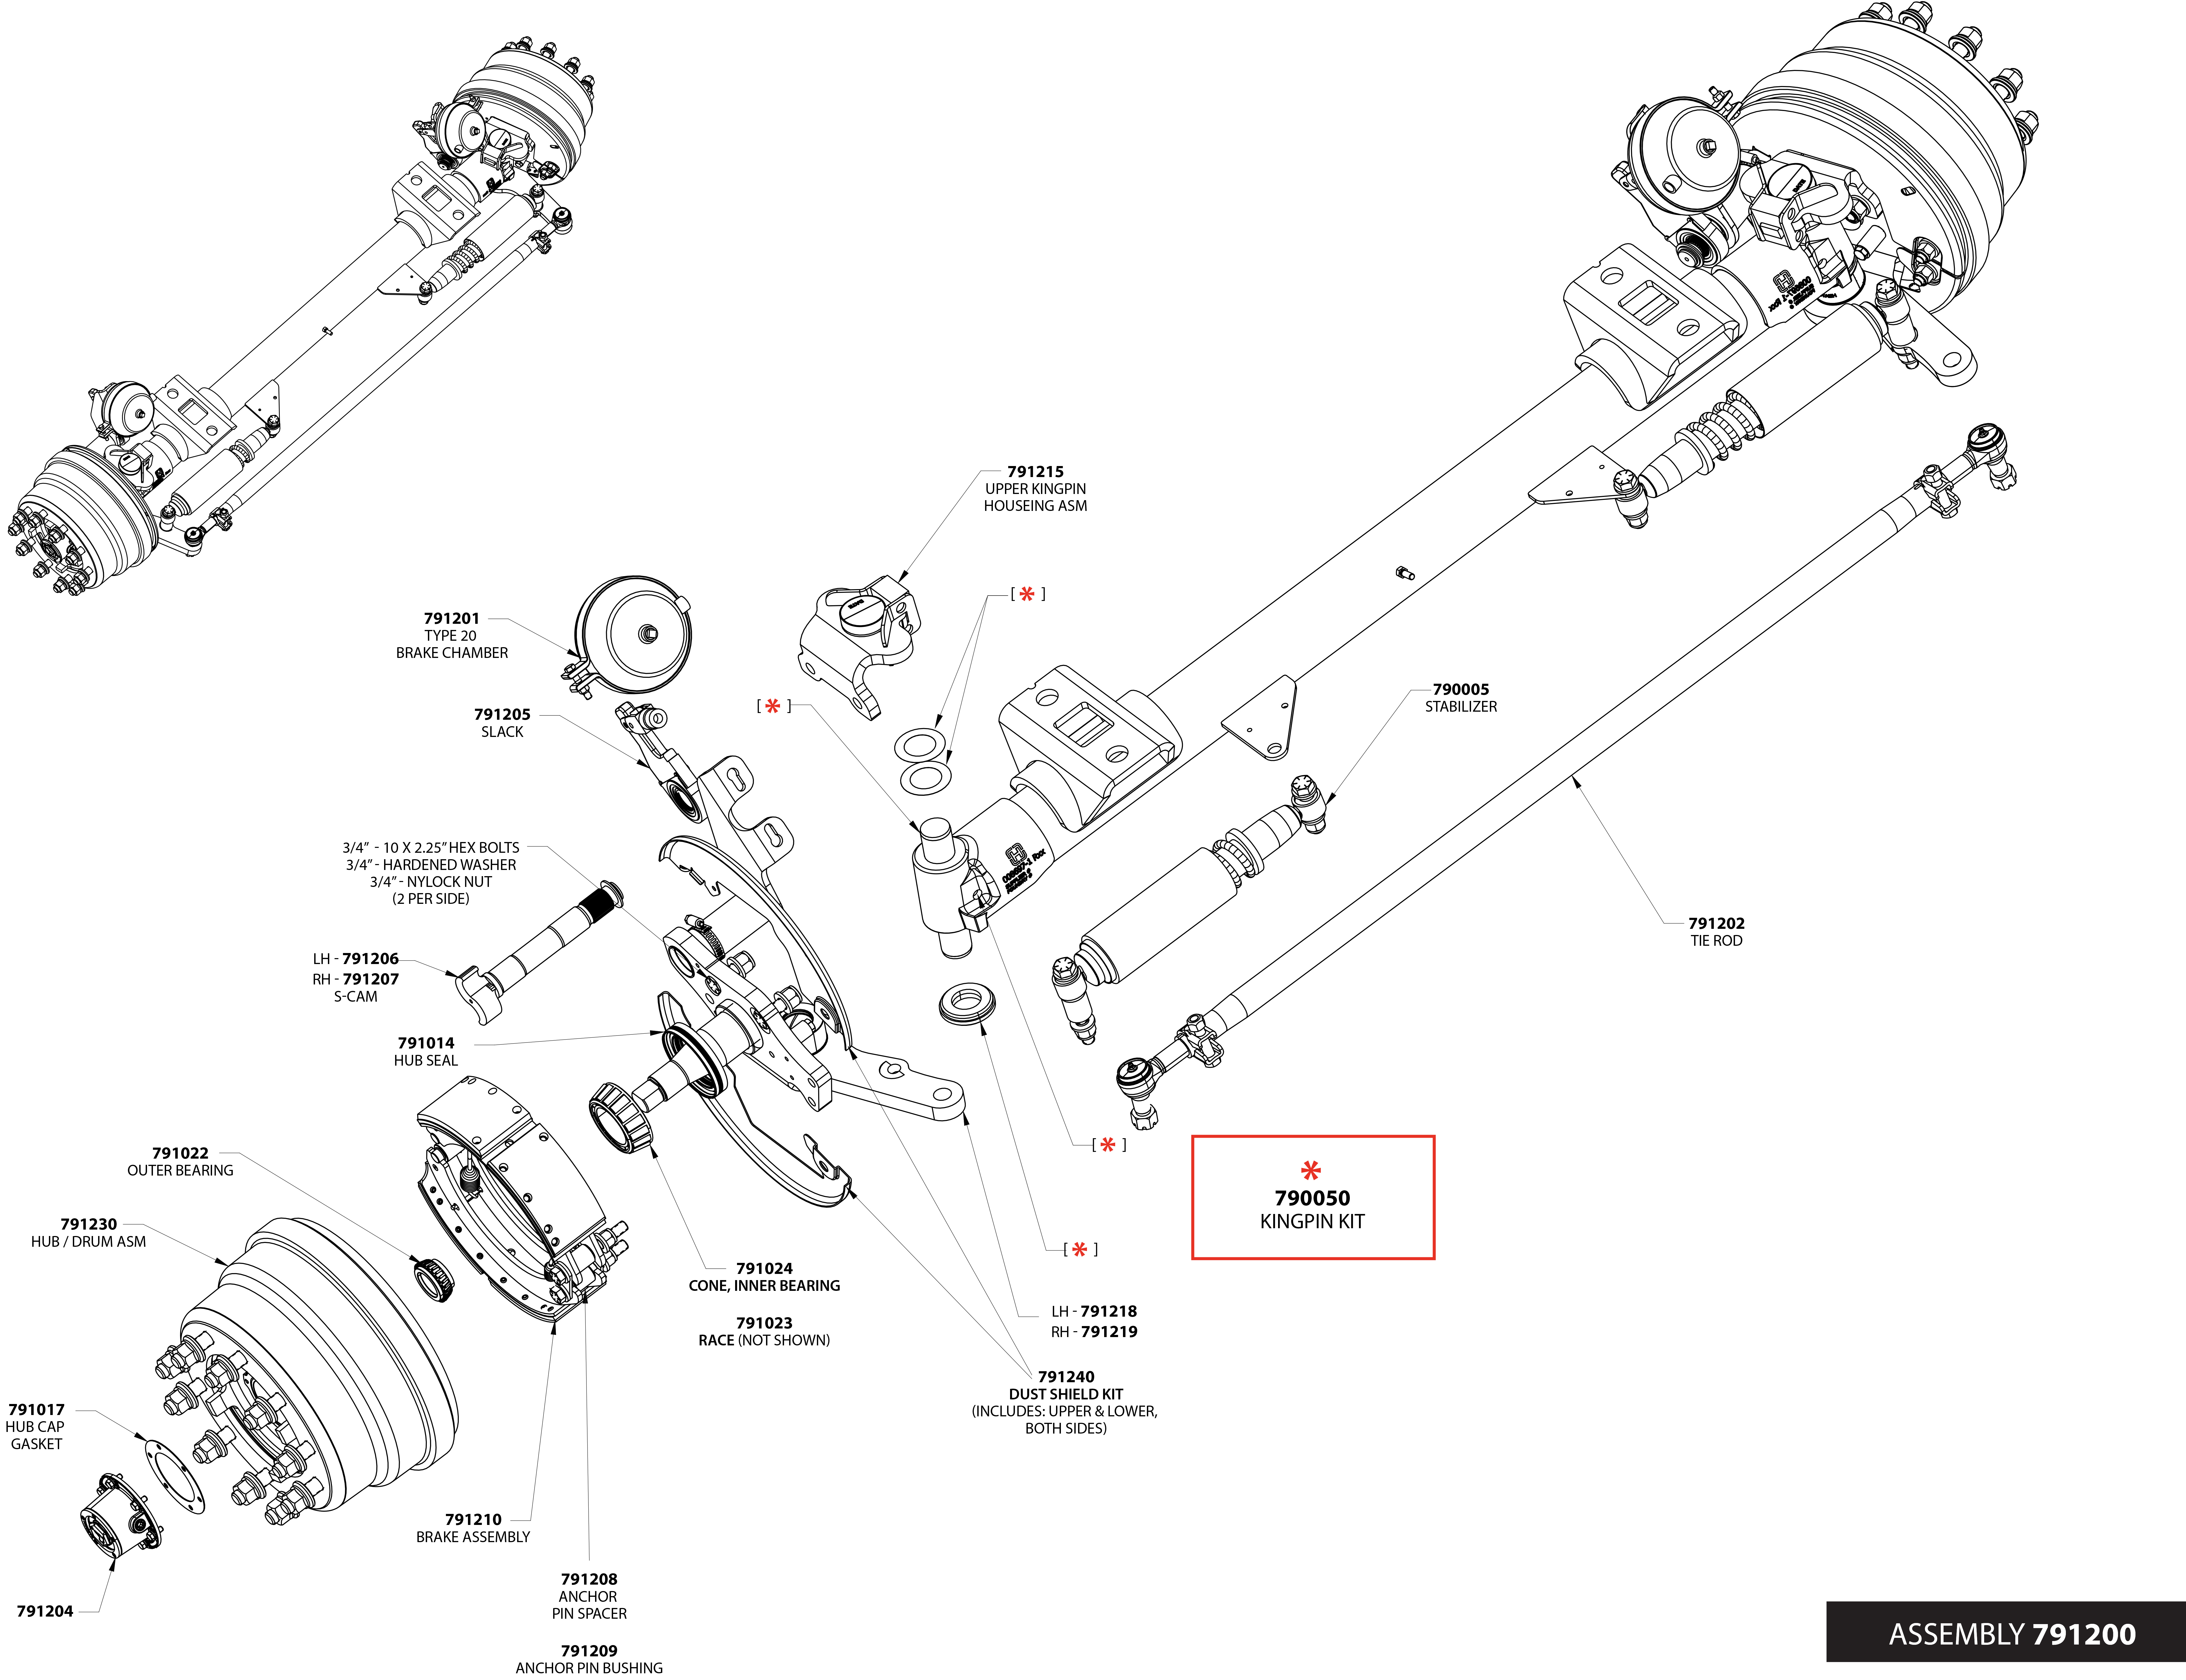 con-tech-bk-axle-drawing.jpg